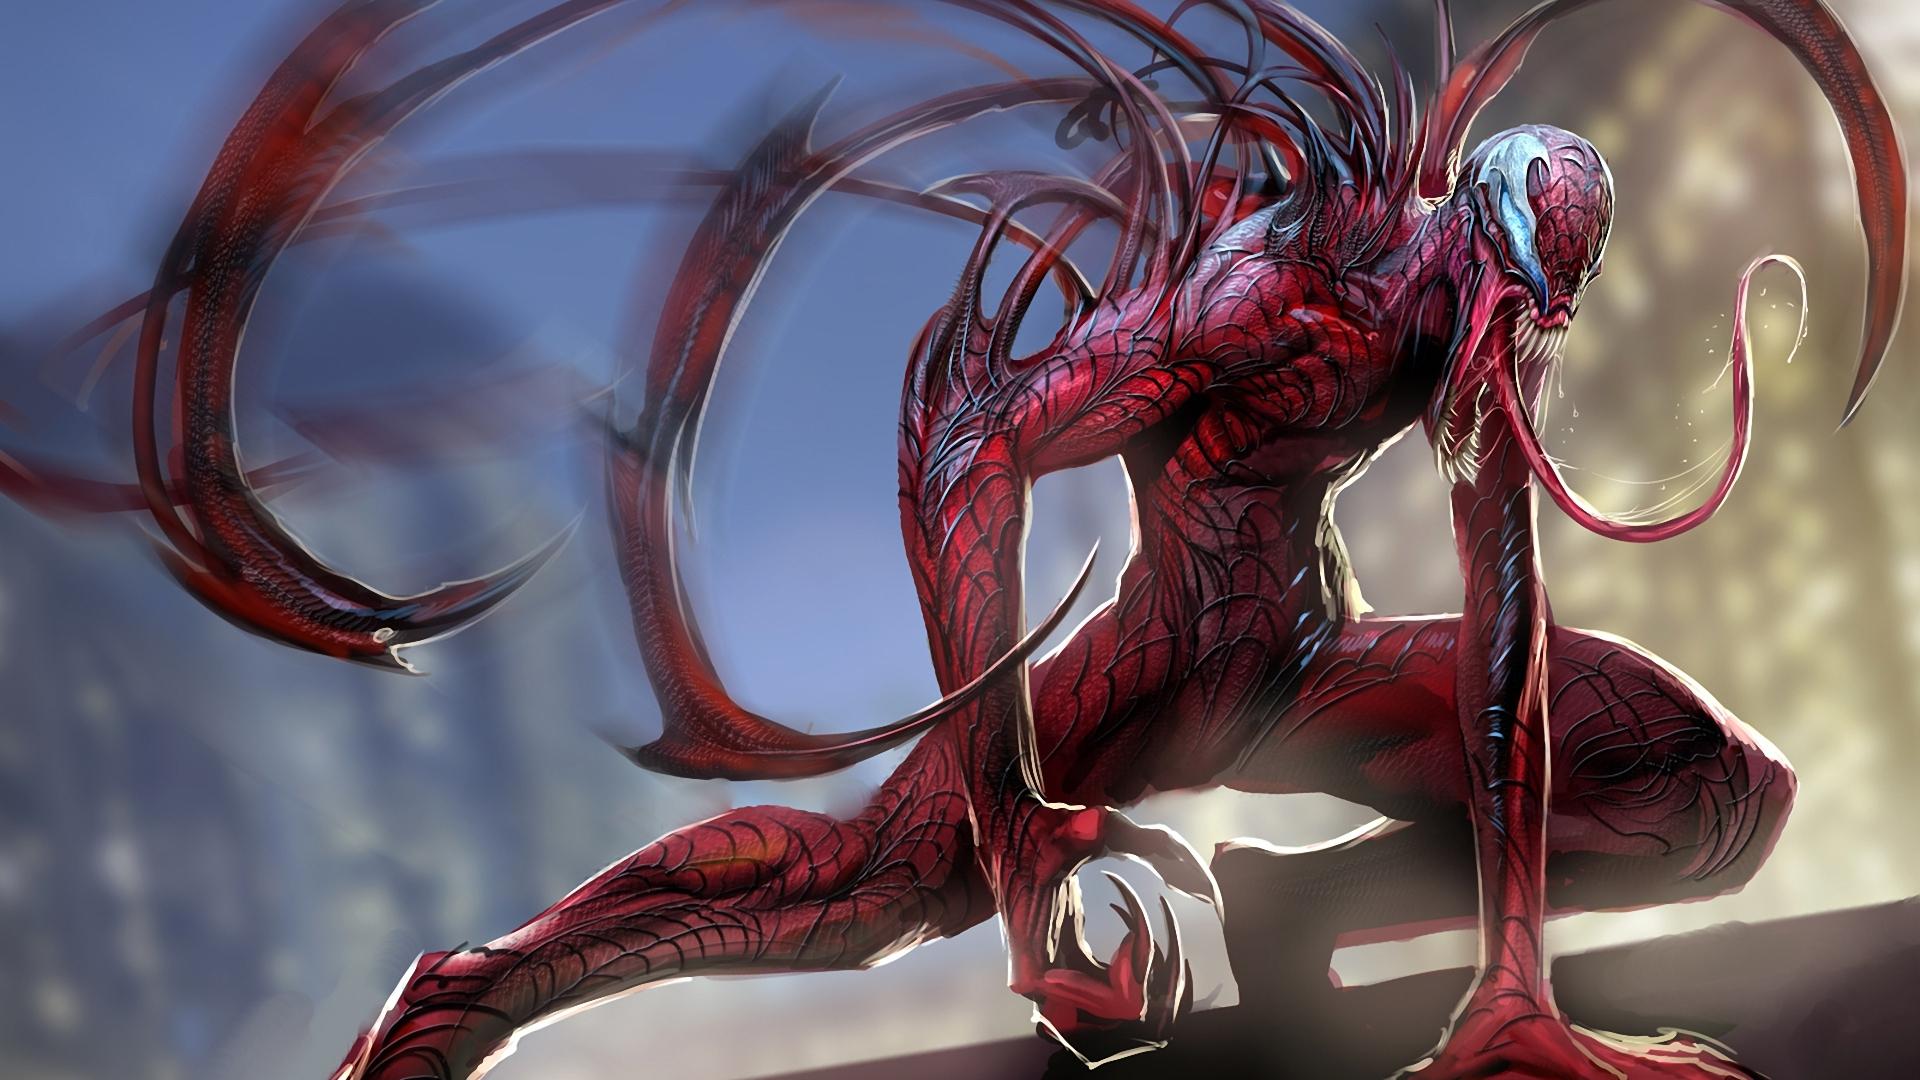 Alien Spiderman 3D Wallpaper   HQ Wallpapers download 100 high 1920x1080